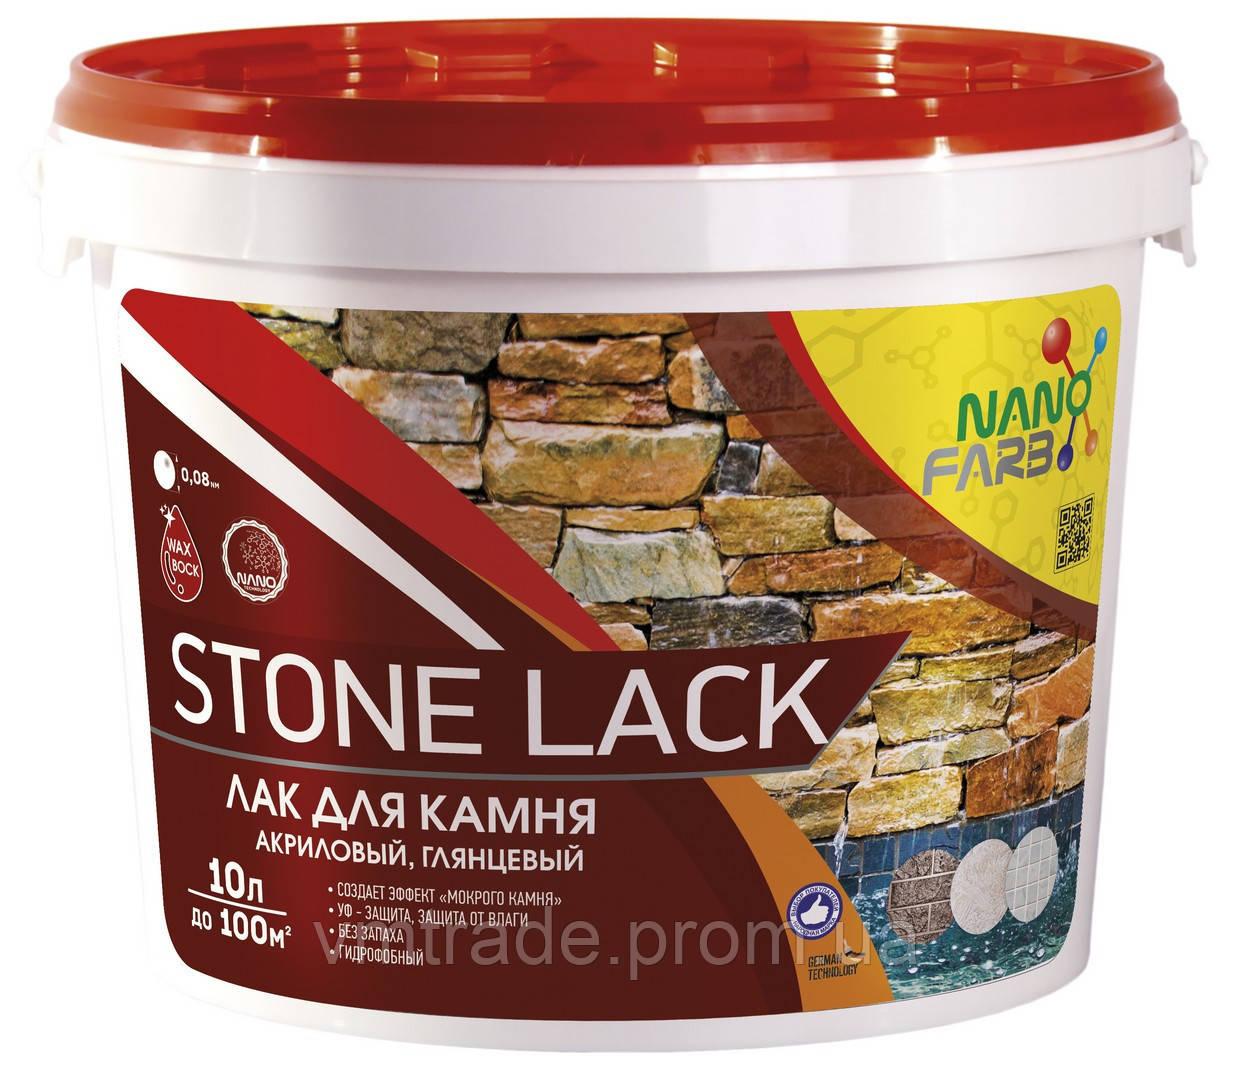 Лак для камня Stone Lack НаноФарб (NanoFarb) 10 л